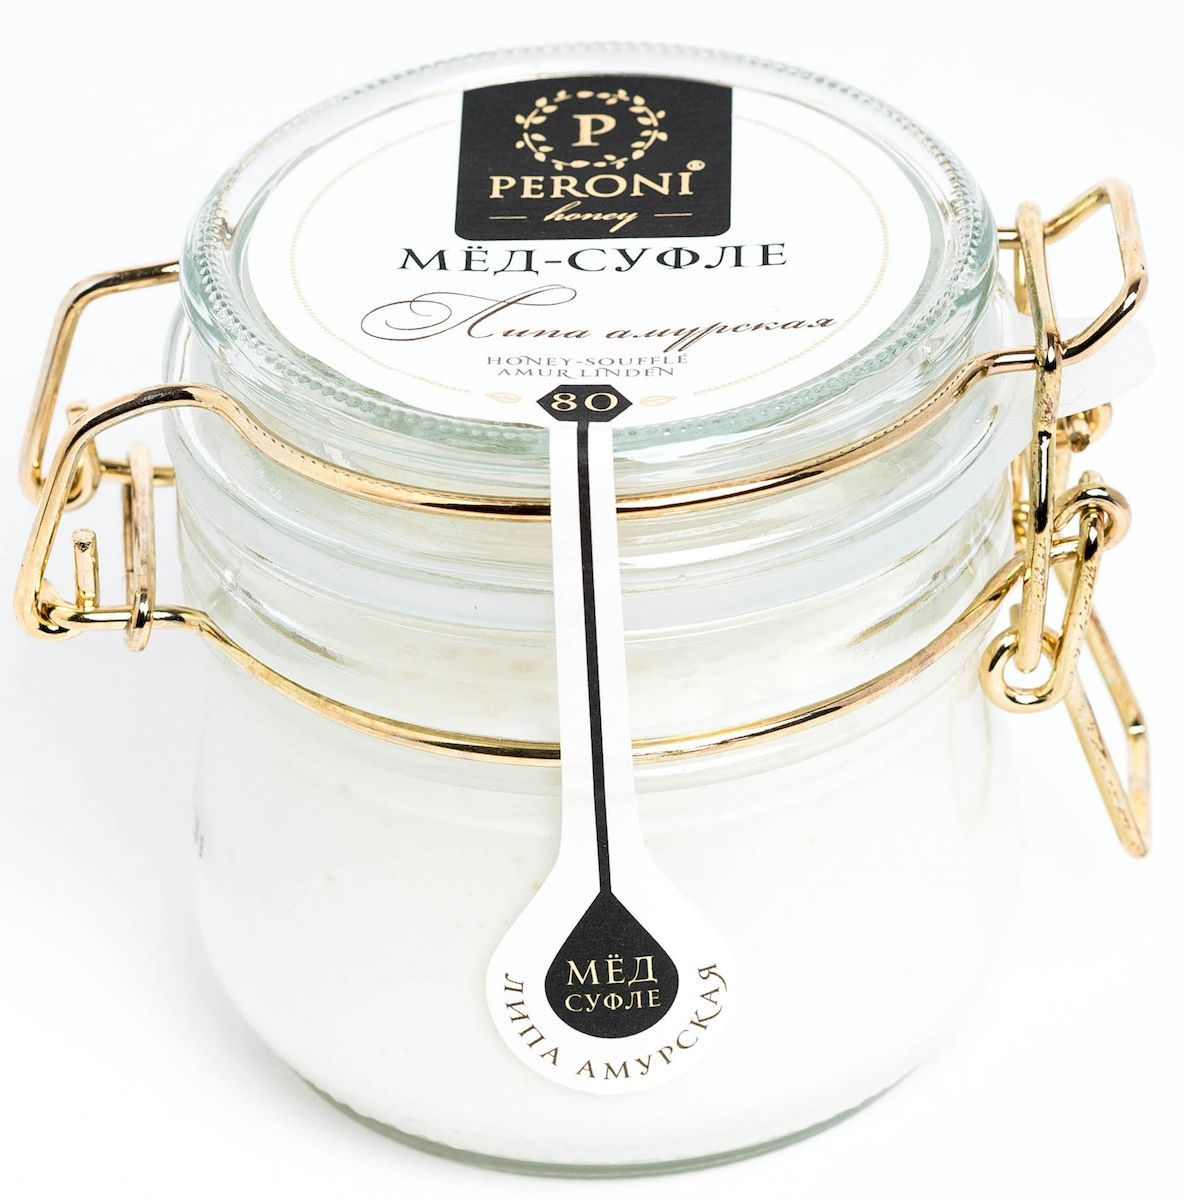 Peroni Липа амурская мед-суфле, 230 г peroni кедровый орешек мёд суфле 220 г